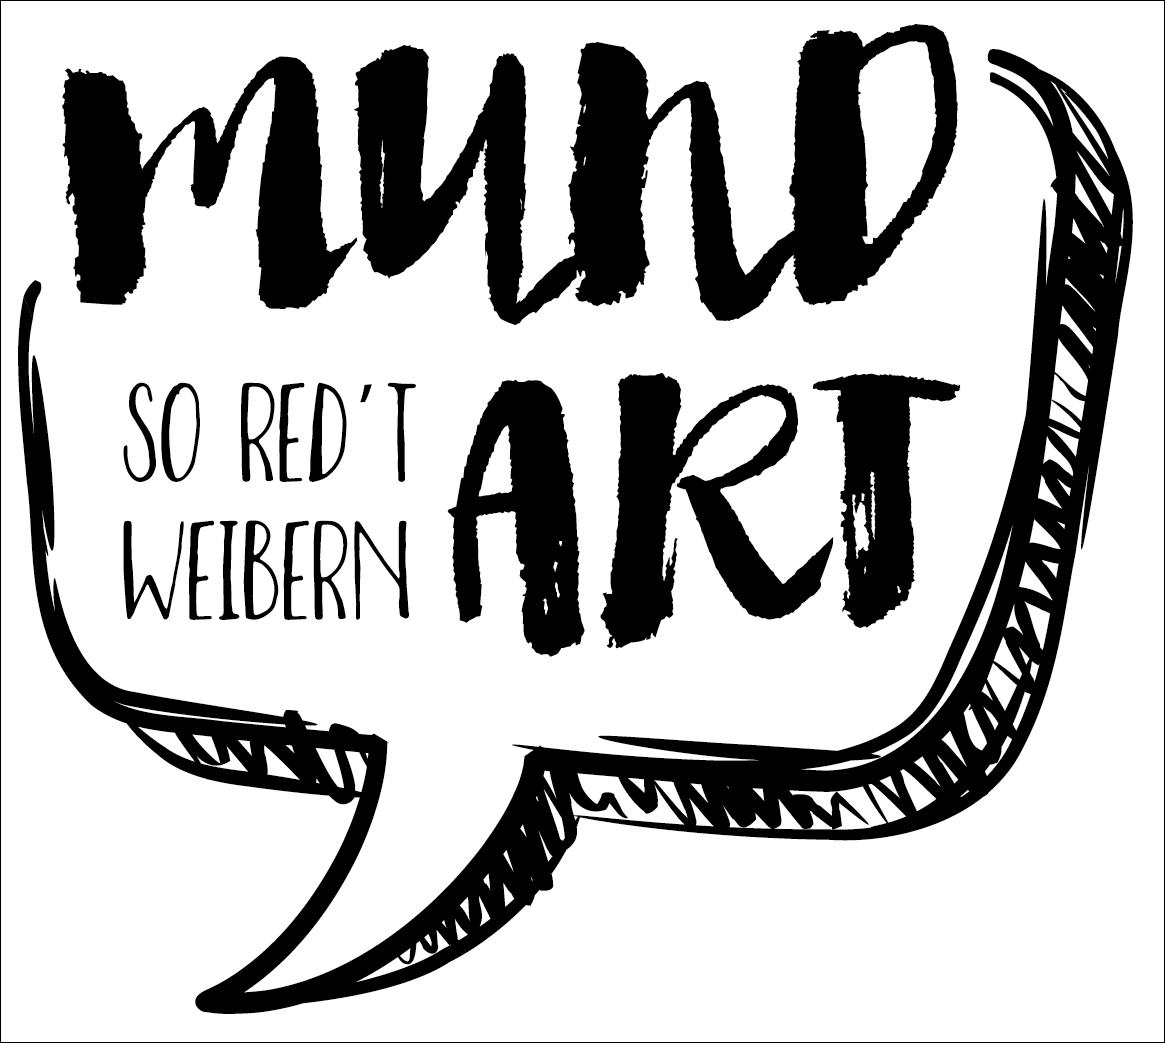 MUNDART – so red´t Weibern